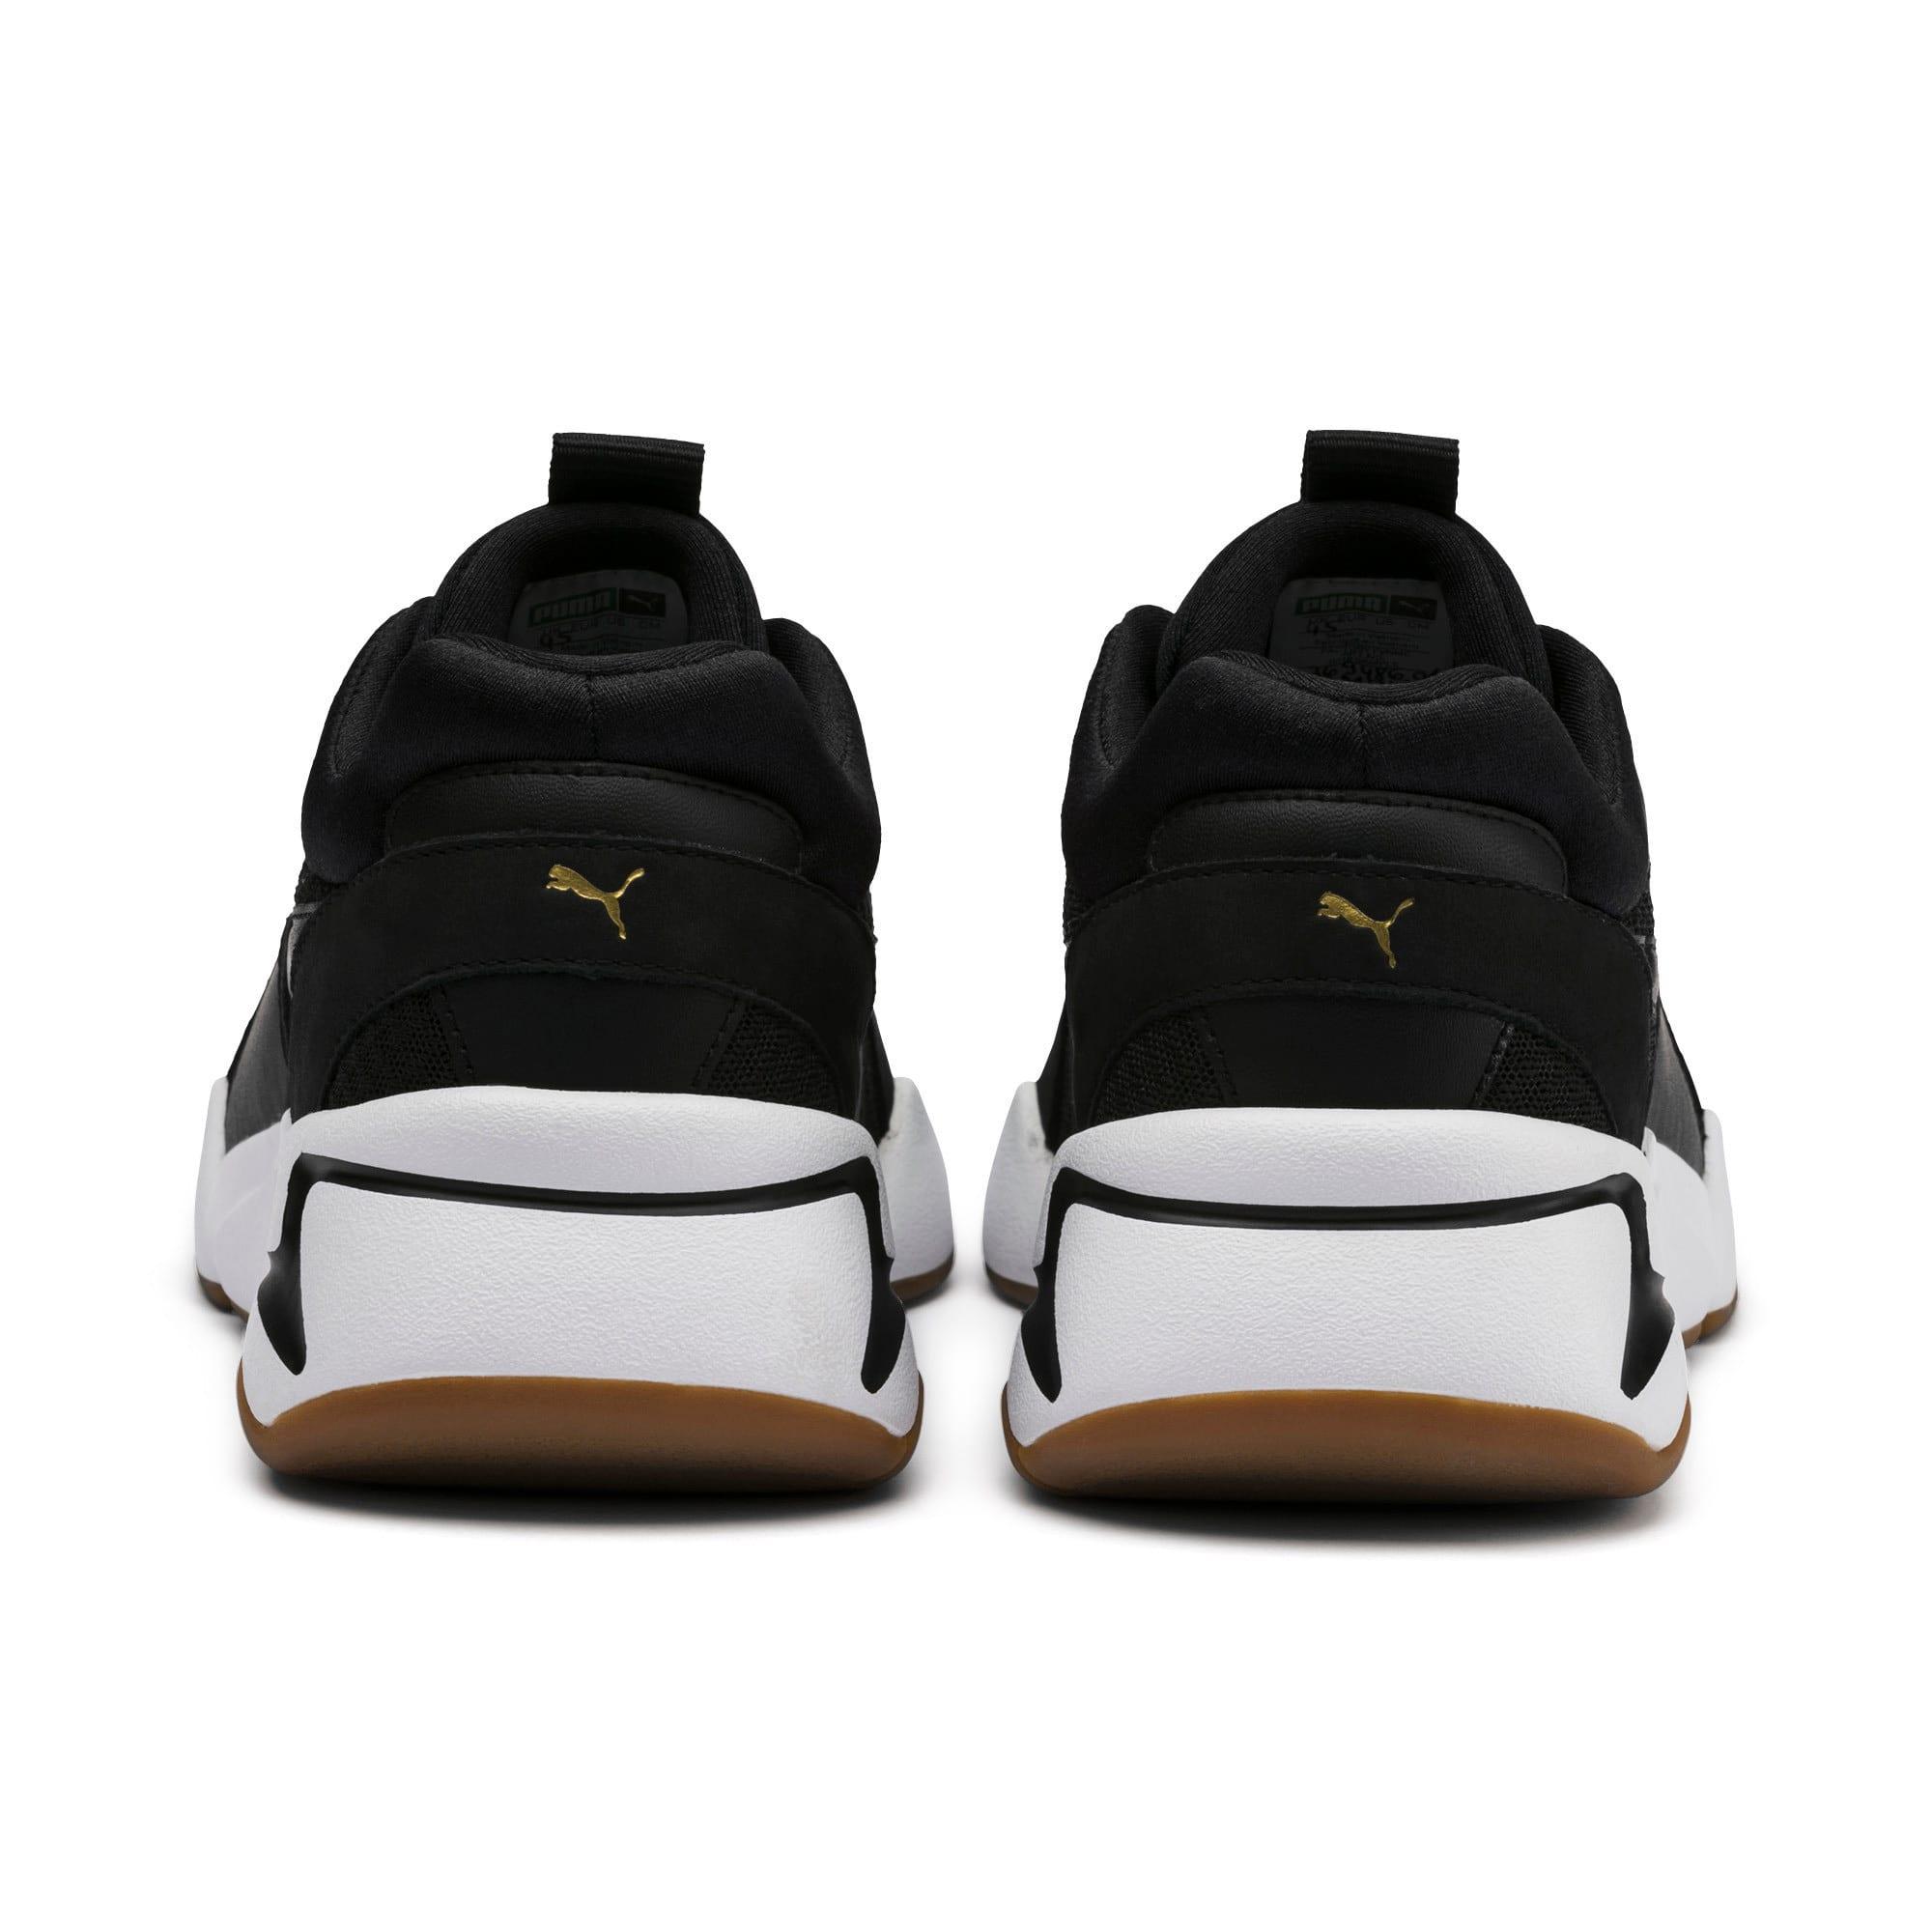 Thumbnail 4 of Nova '90s Bloc Women's Sneakers, Puma Black-Puma Black, medium